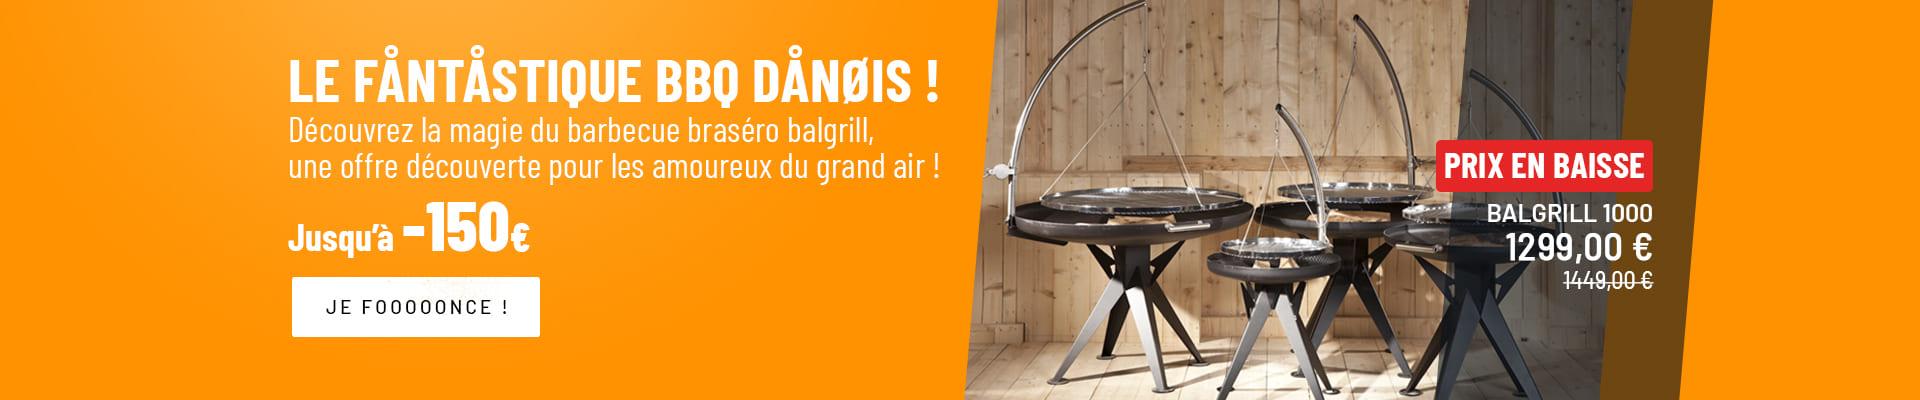 Nielsen - Le barbecue brasero scandinave